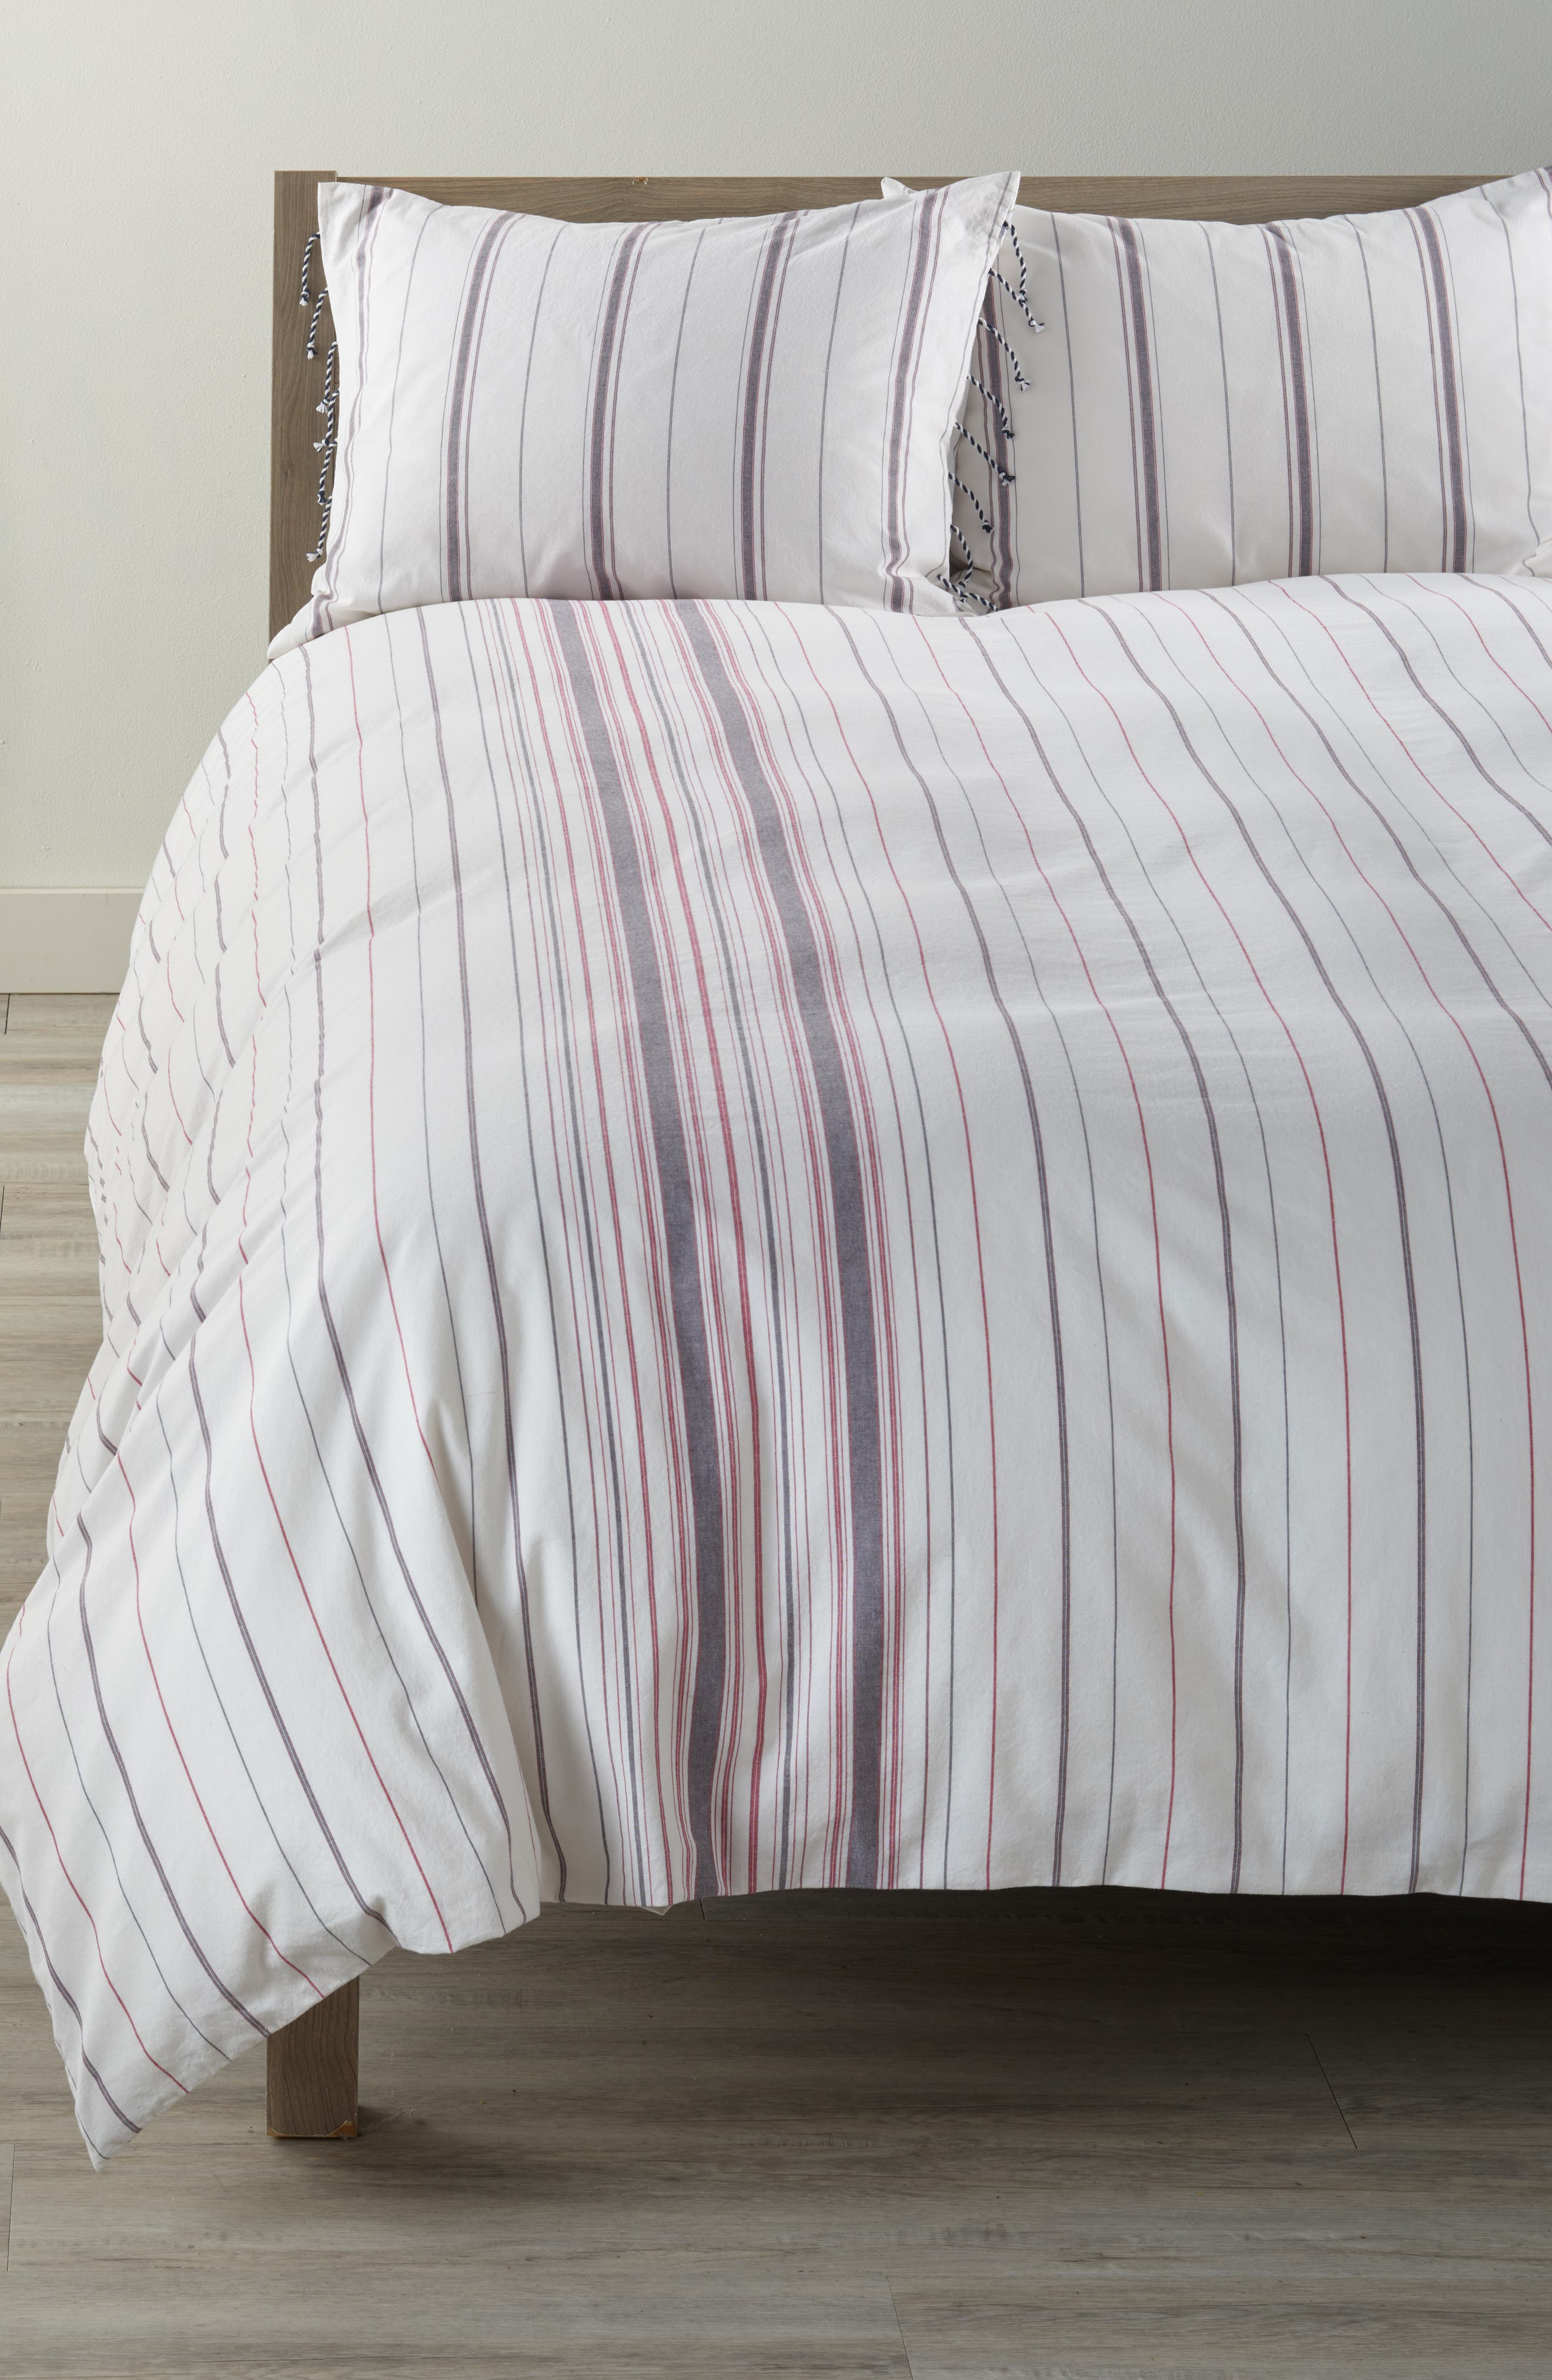 Mixed Stripe Duvet Cover,                             Main thumbnail 1, color,                             900